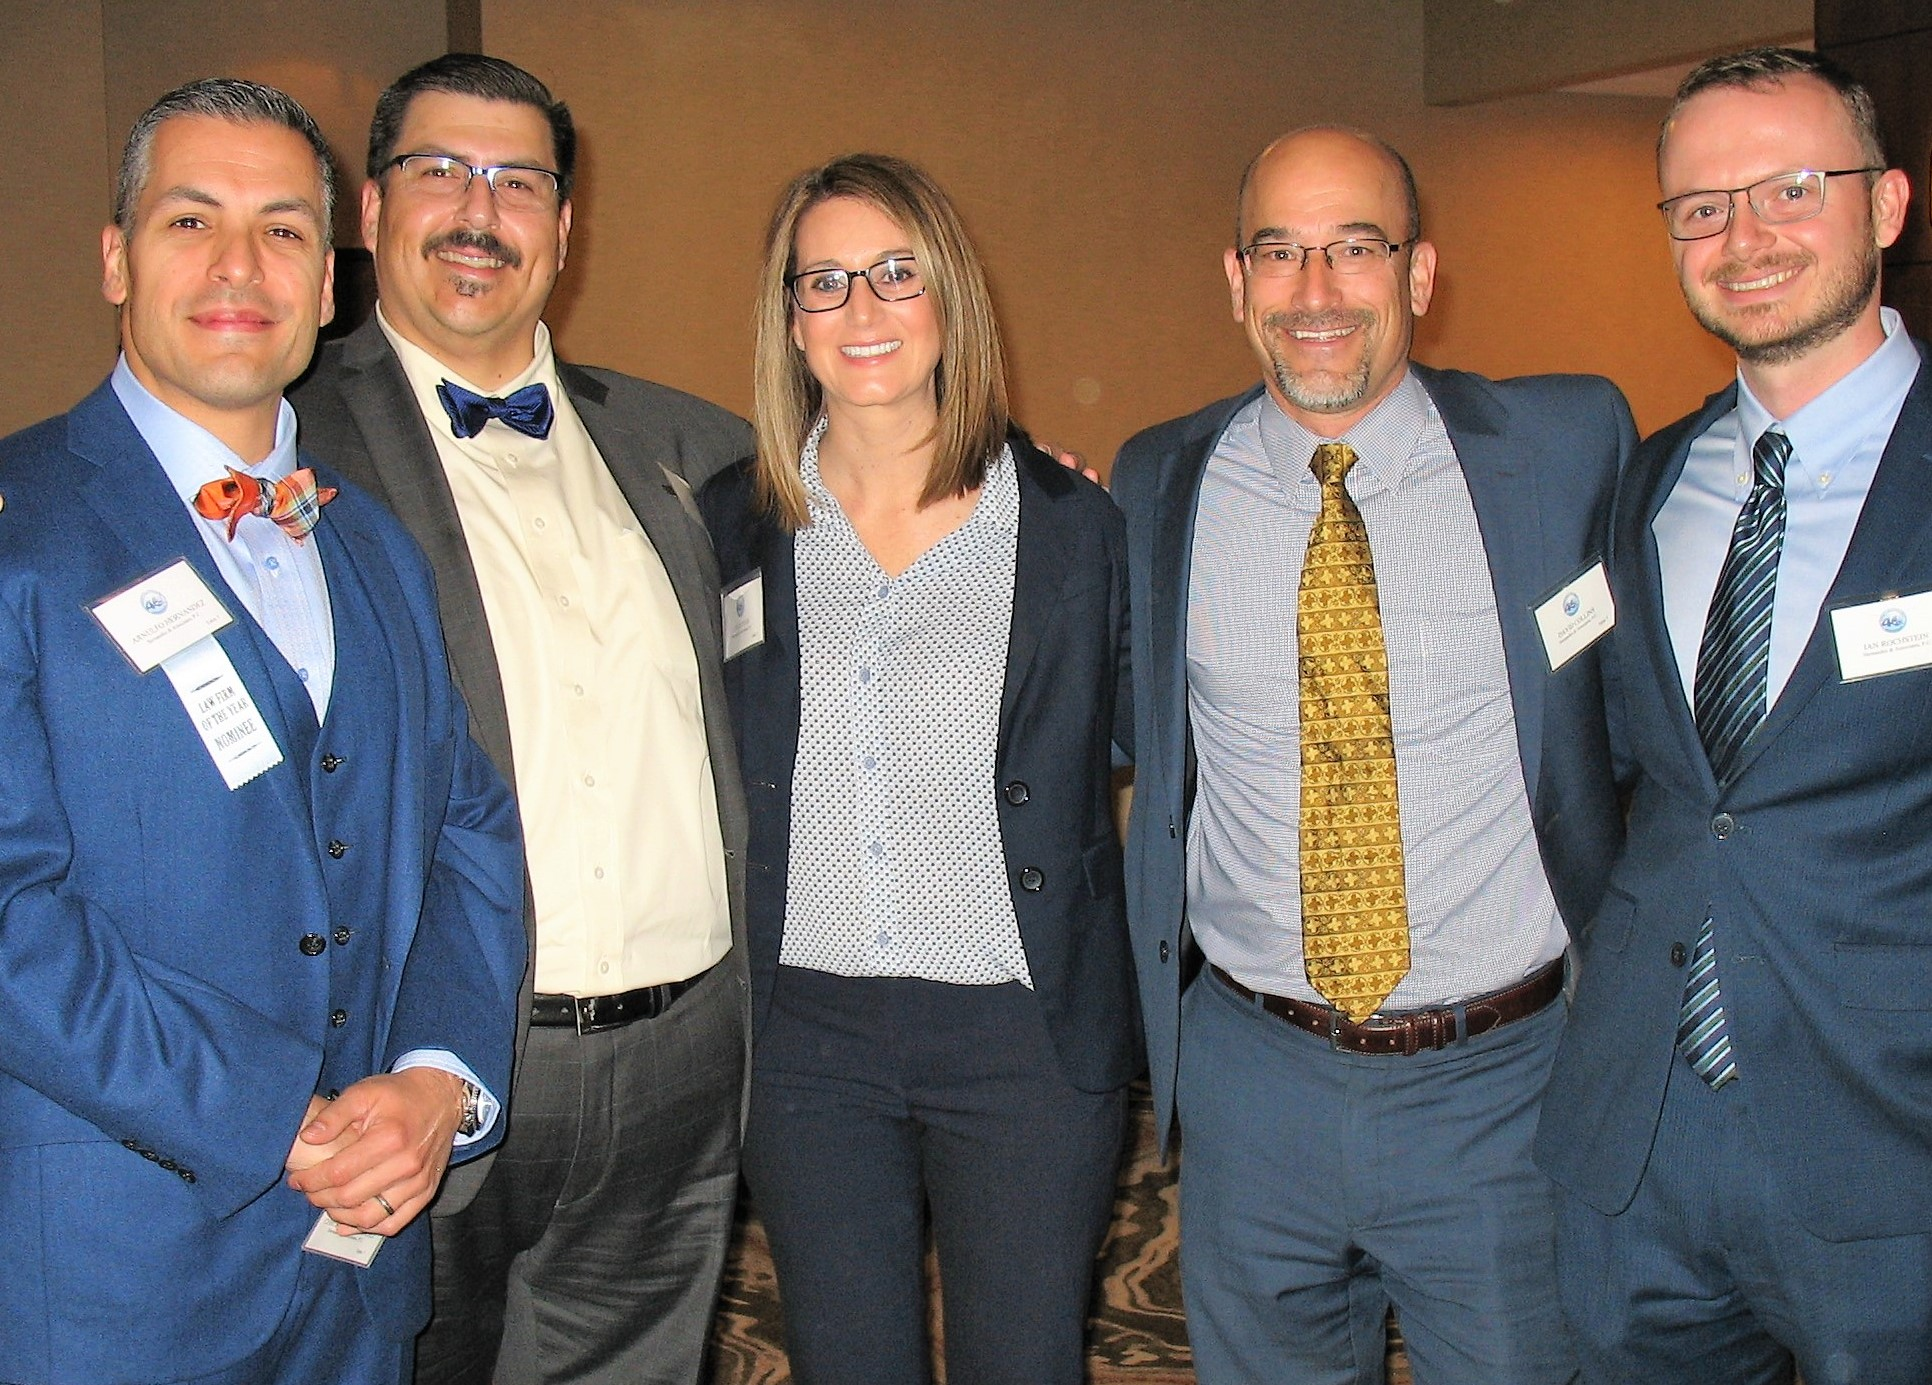 DSCN1288 Arnulfo Hernandez, Jose Hernandez, Leslie Pugh, David Collins & Ian Rochstein.jpg